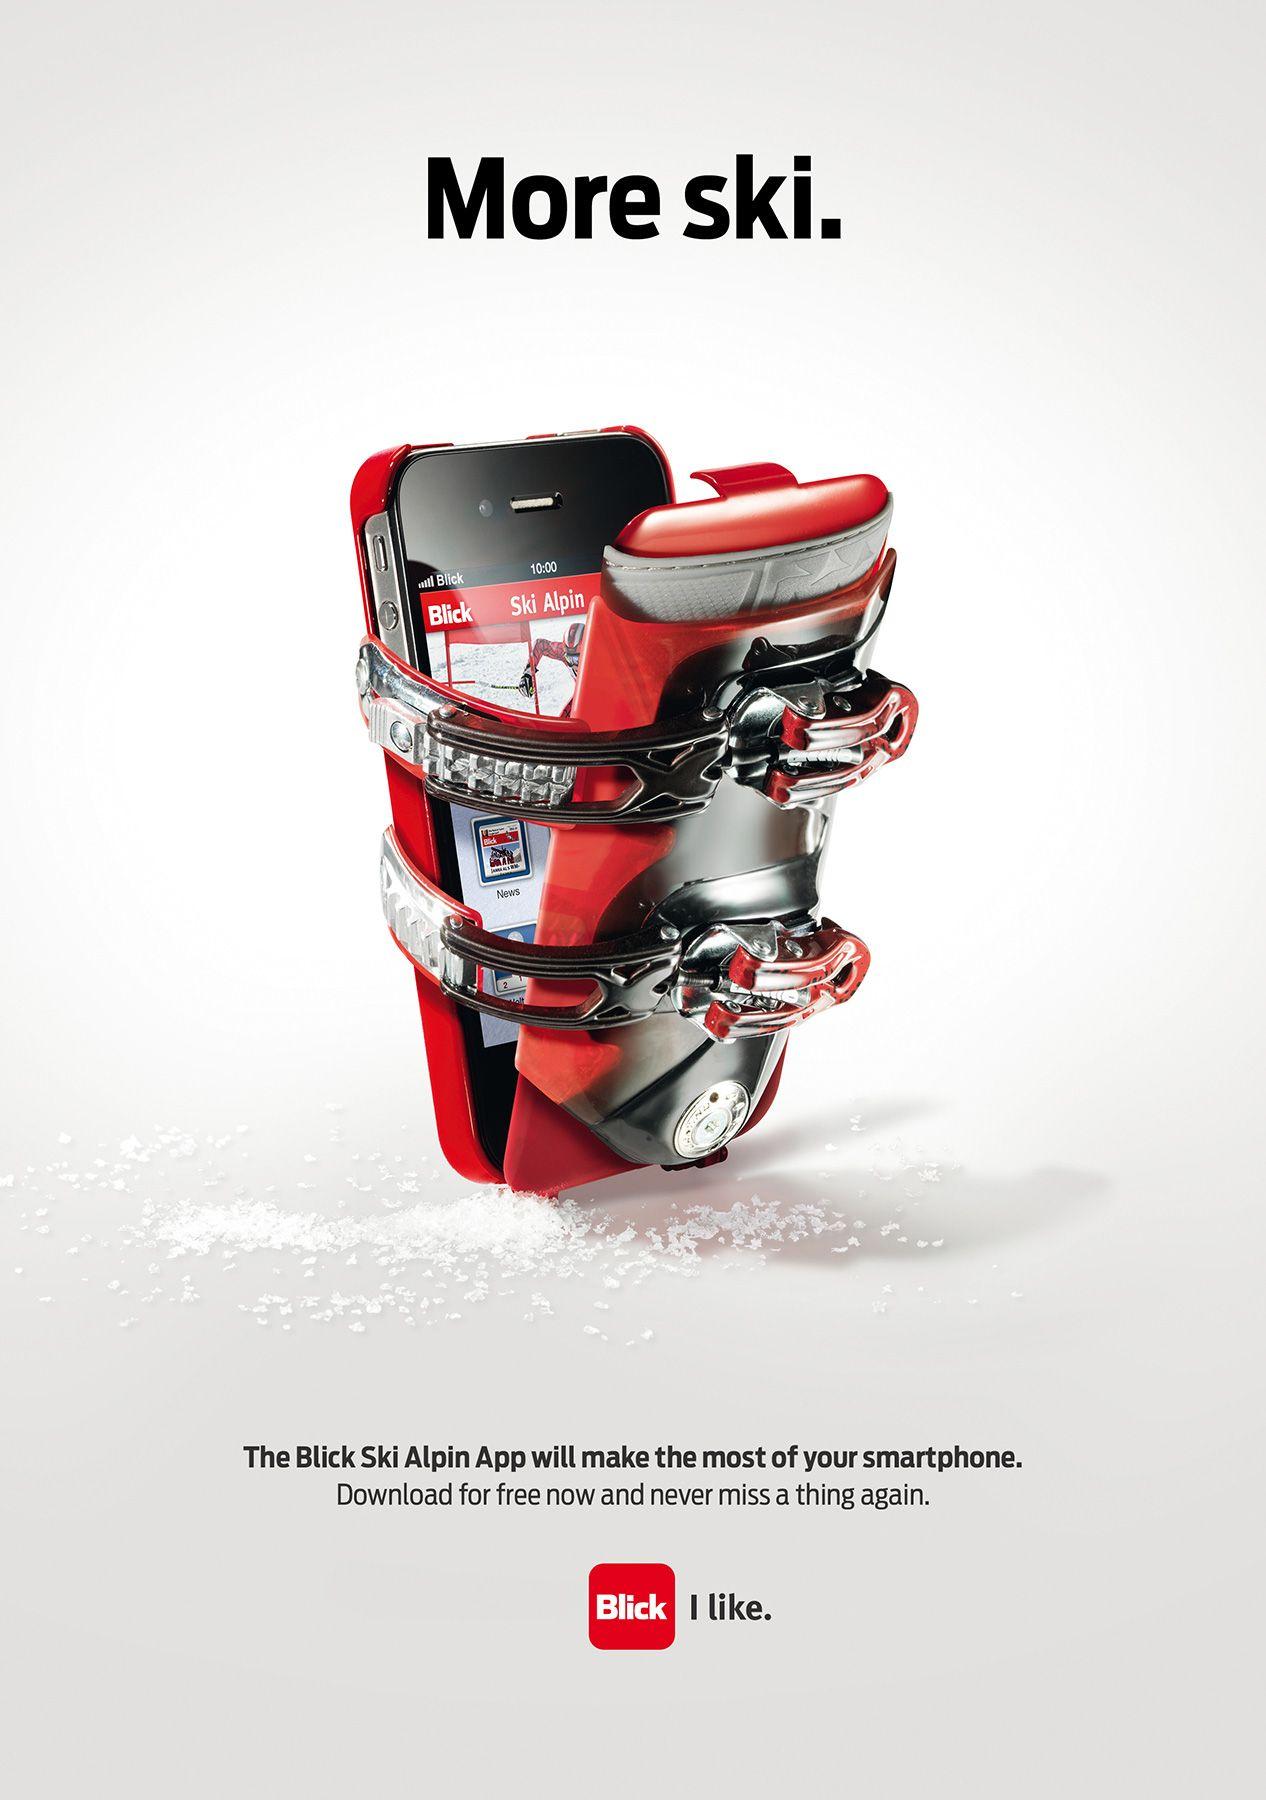 Blick ad print print ads best iphone advertising